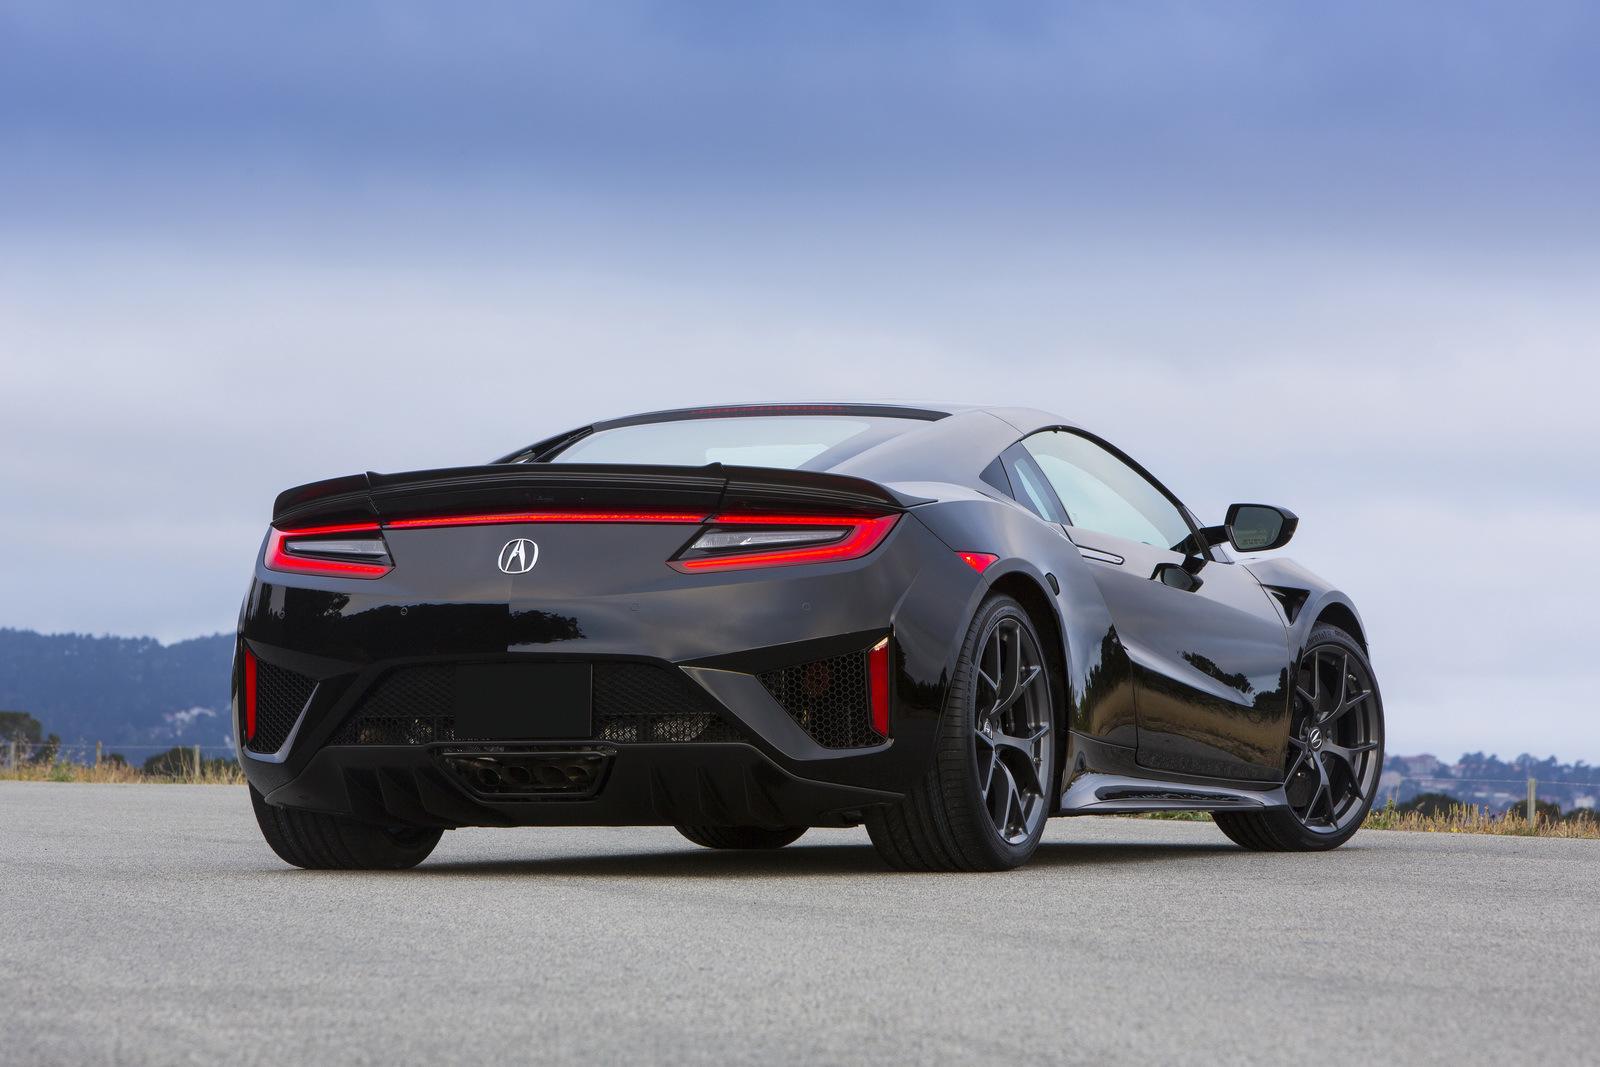 Acura Nsx 2017 Motor >> Acura NSX 2017 (6/22)